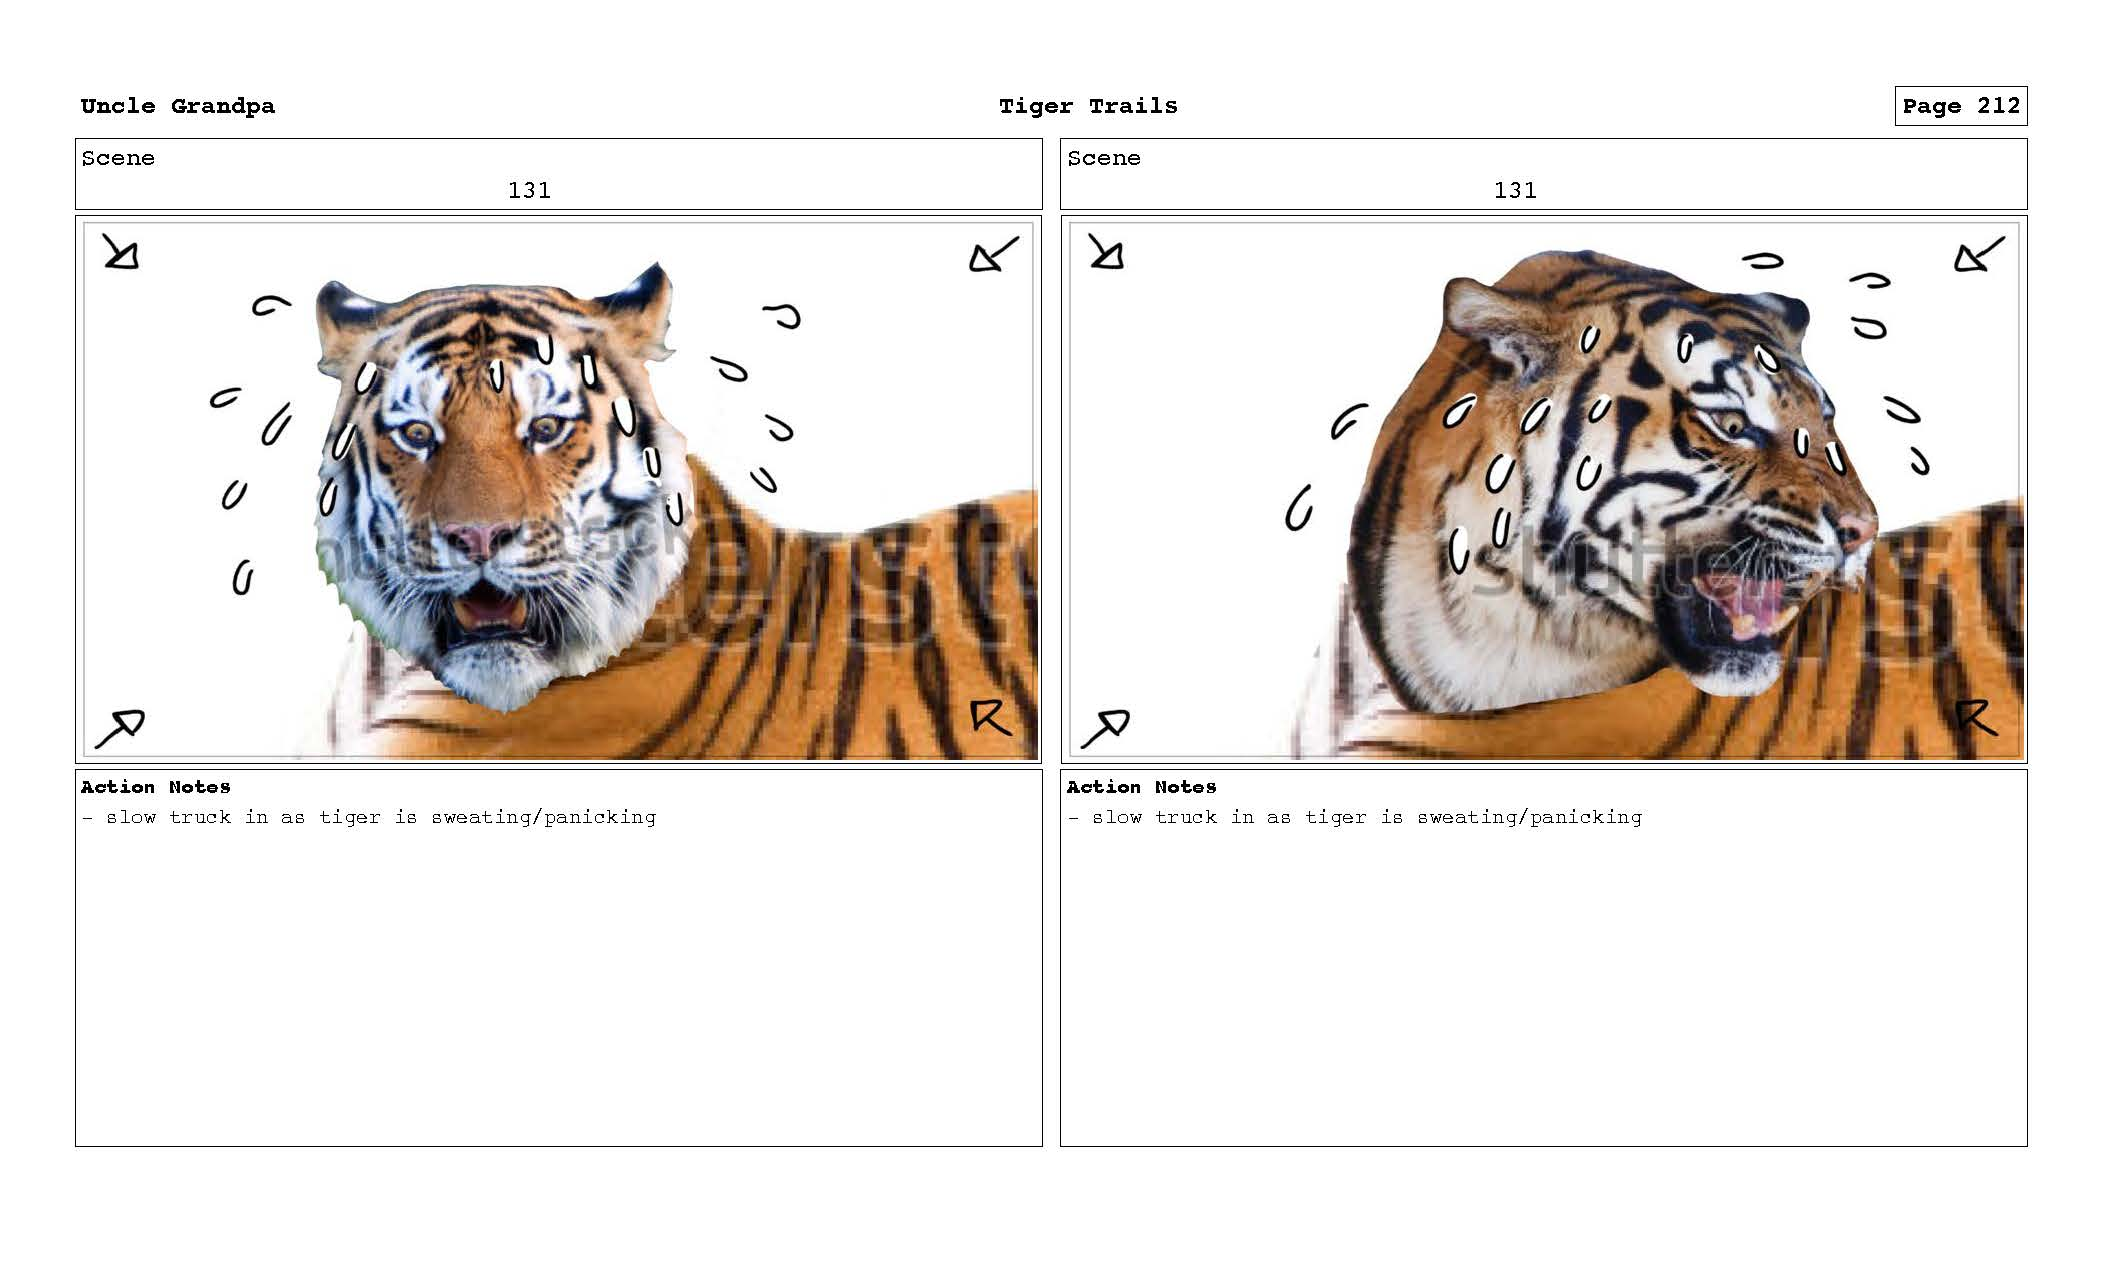 UncleGrandpa_TigerTrails_Page_212.jpg